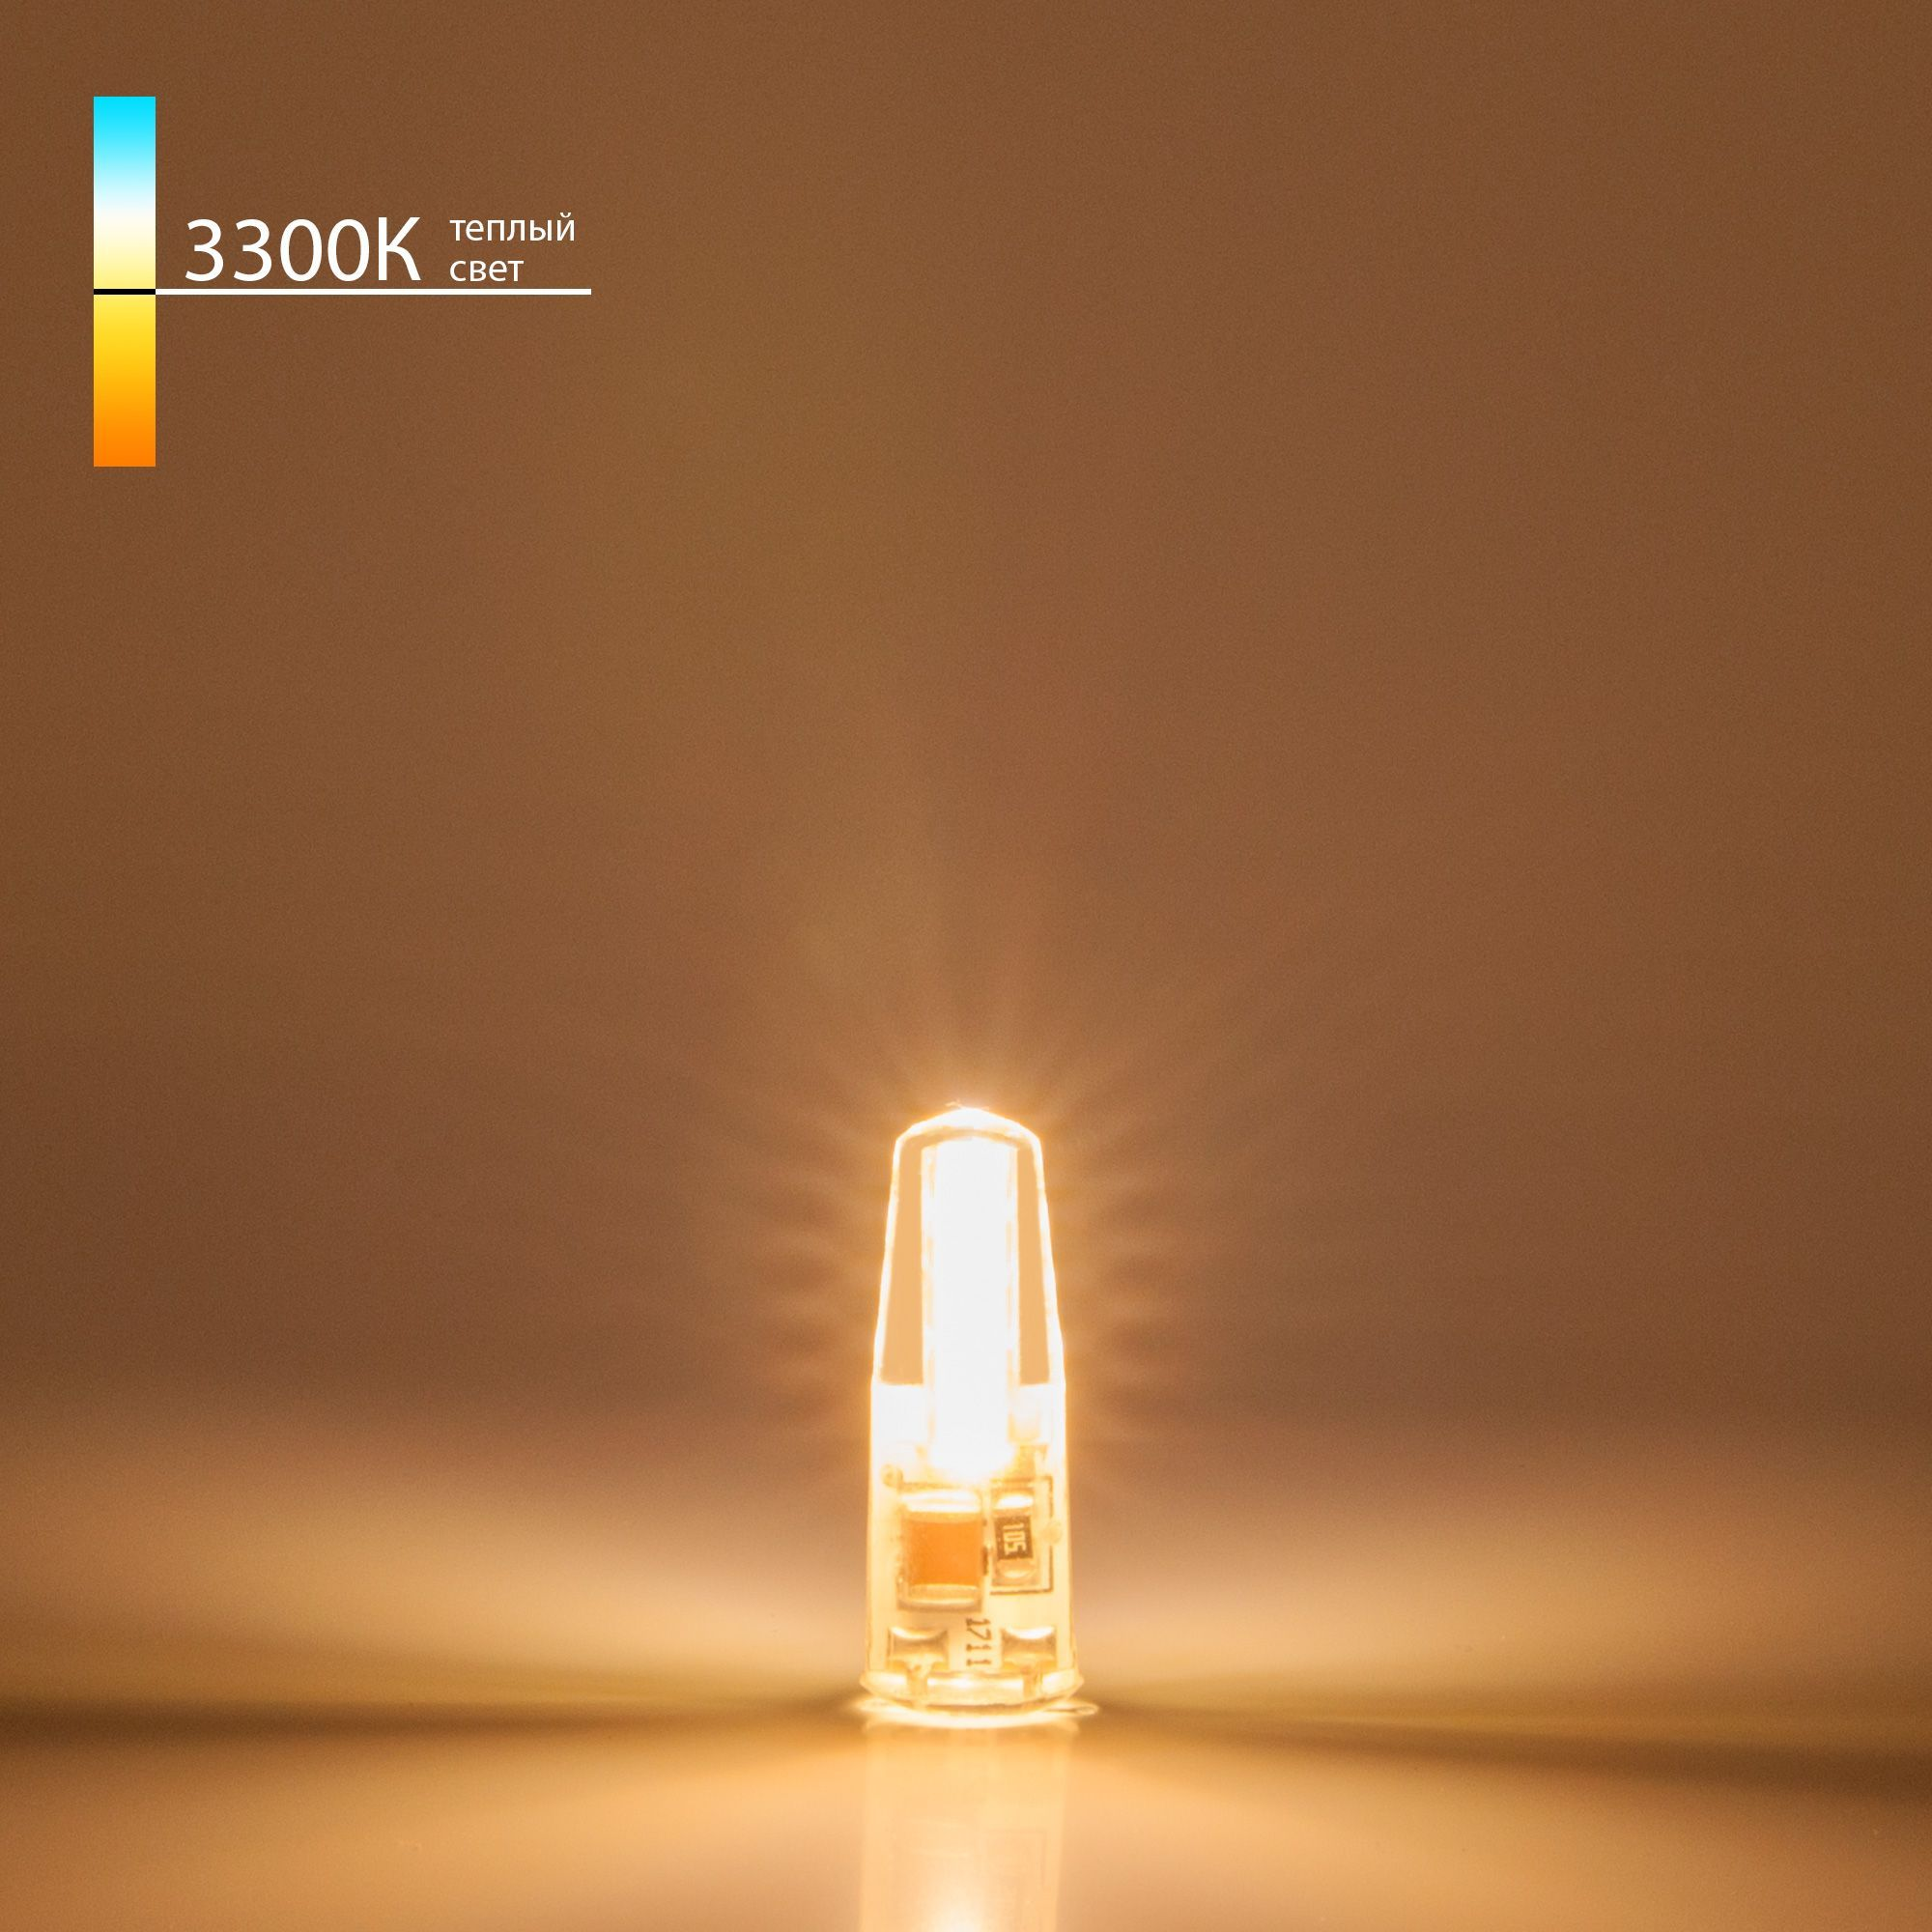 Светодиодная лампа 3W 3300K G4 G4 LED BL123 3W 220V 360 3300K